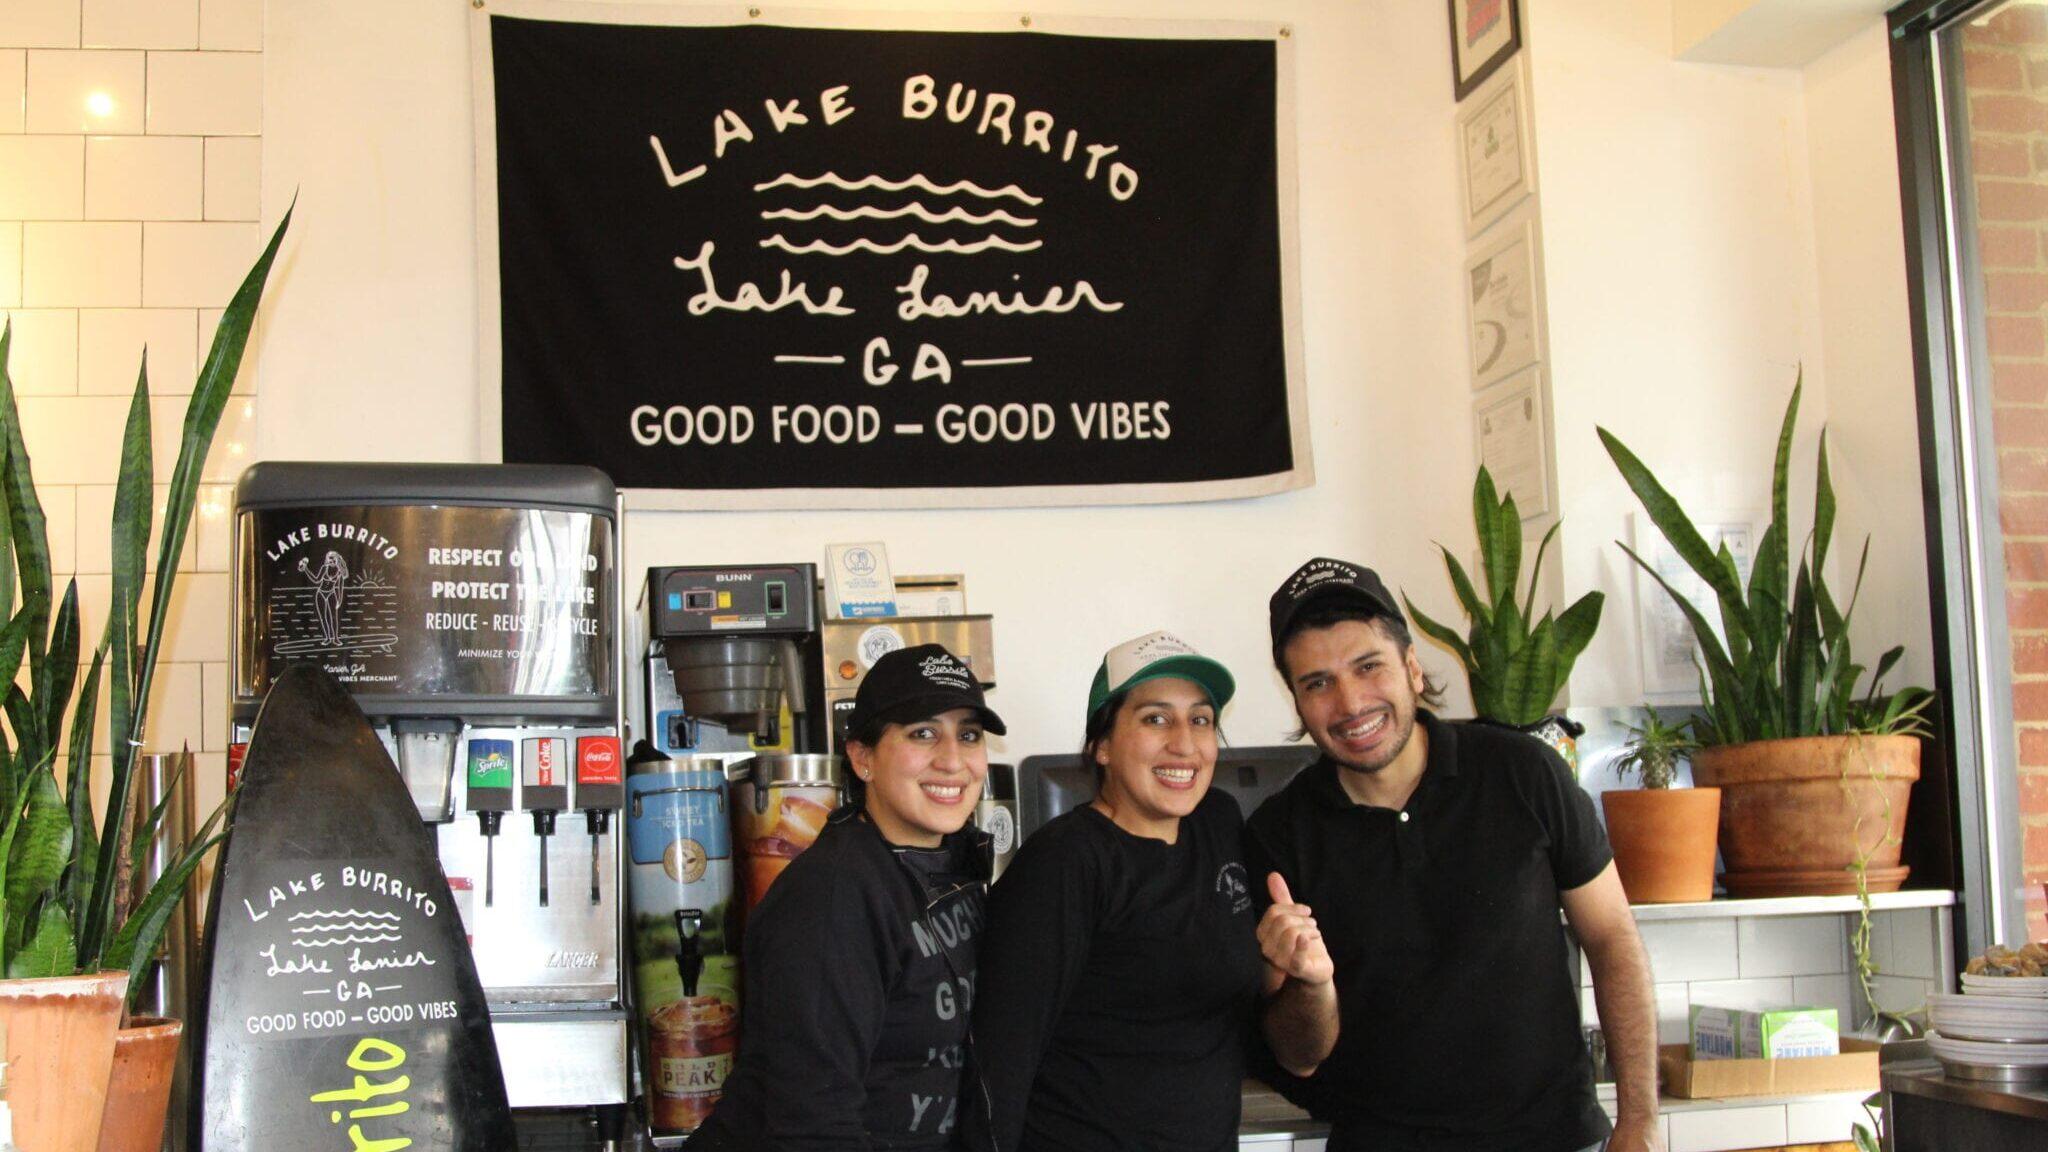 Receta exitosa para negocio de burritos